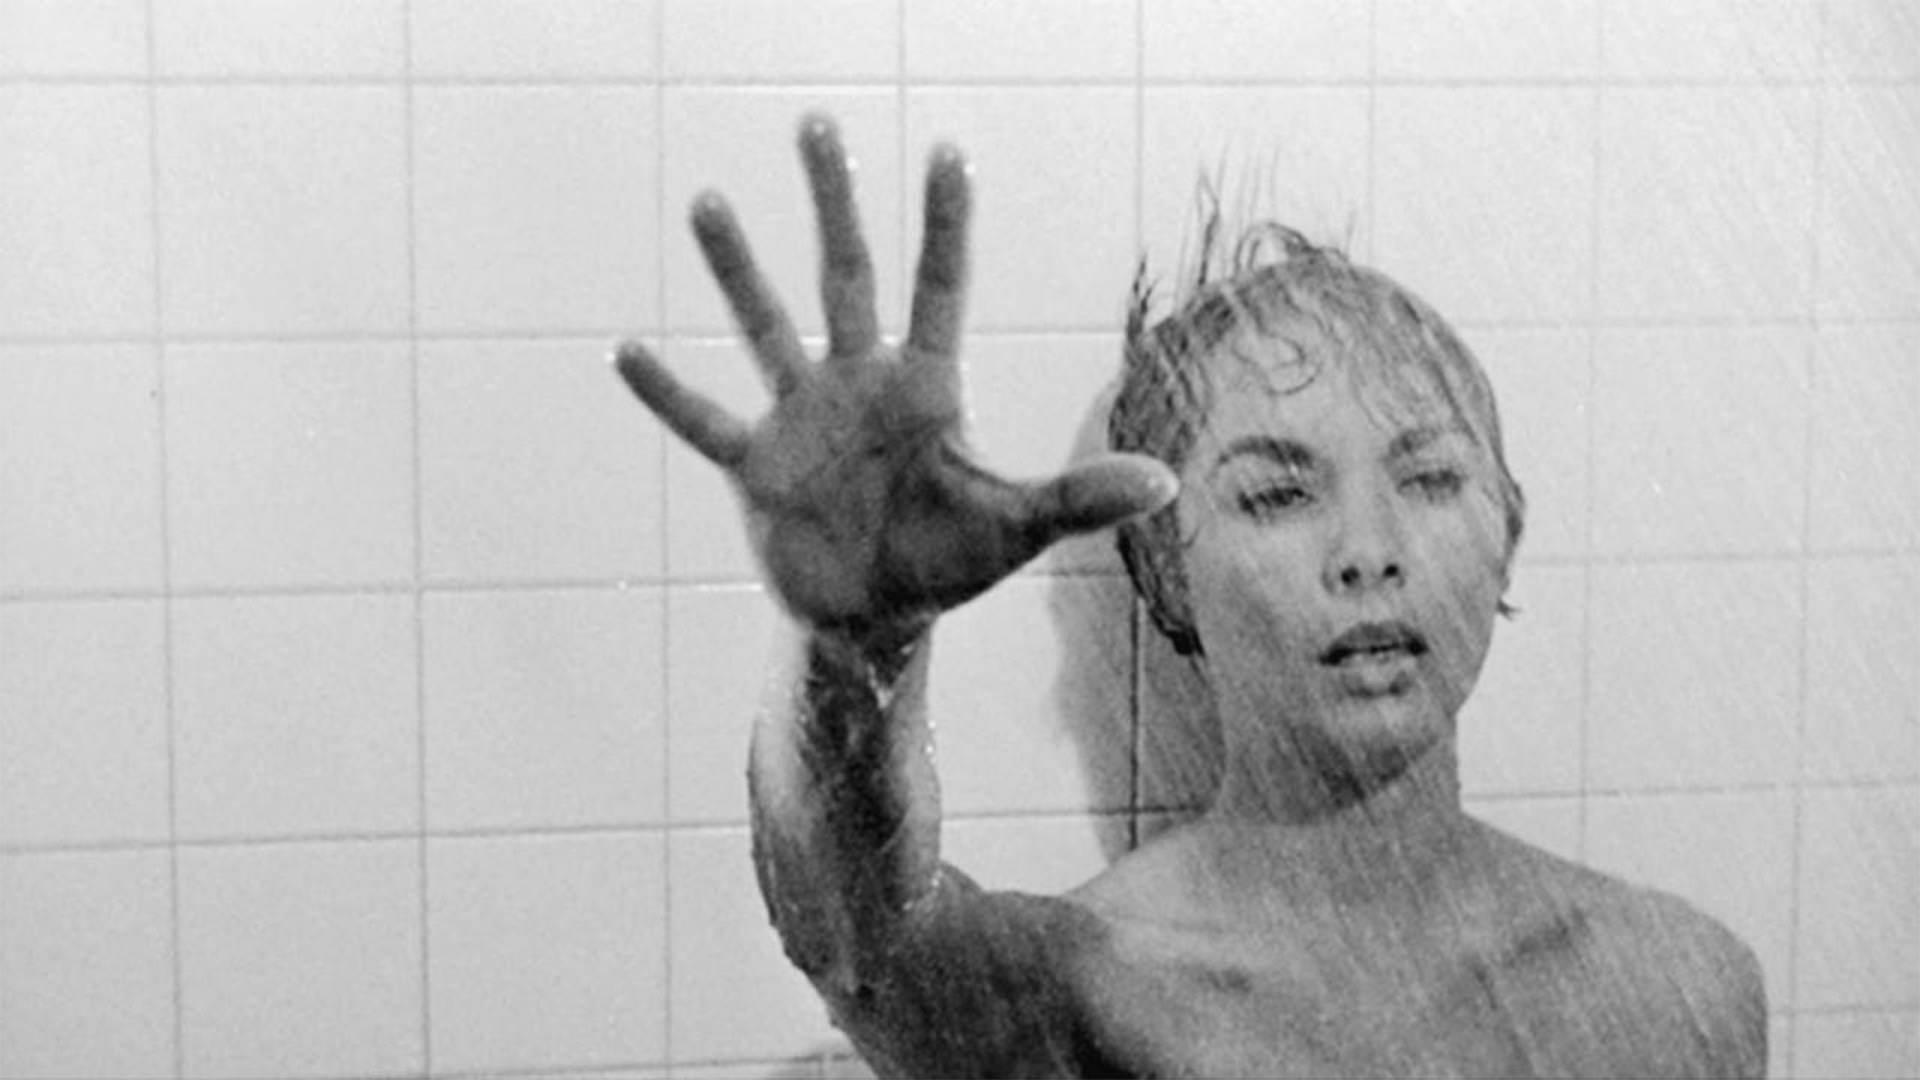 Esther Kahn - French trailer - Summer Phoenix, Ian Holm